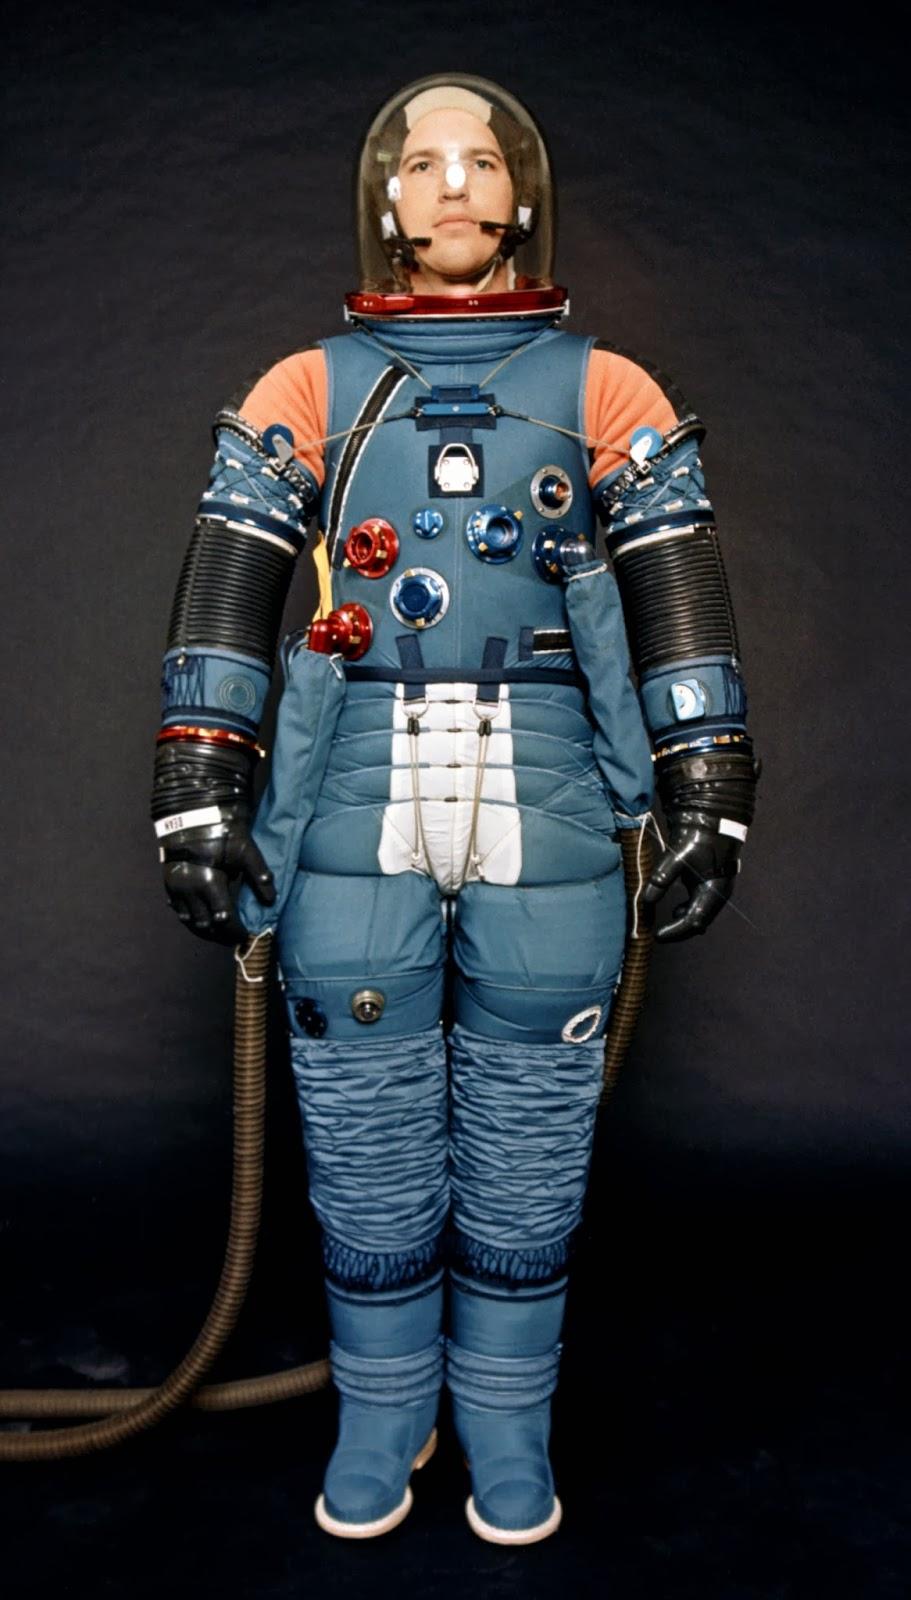 apollo astronauts space suits - photo #22